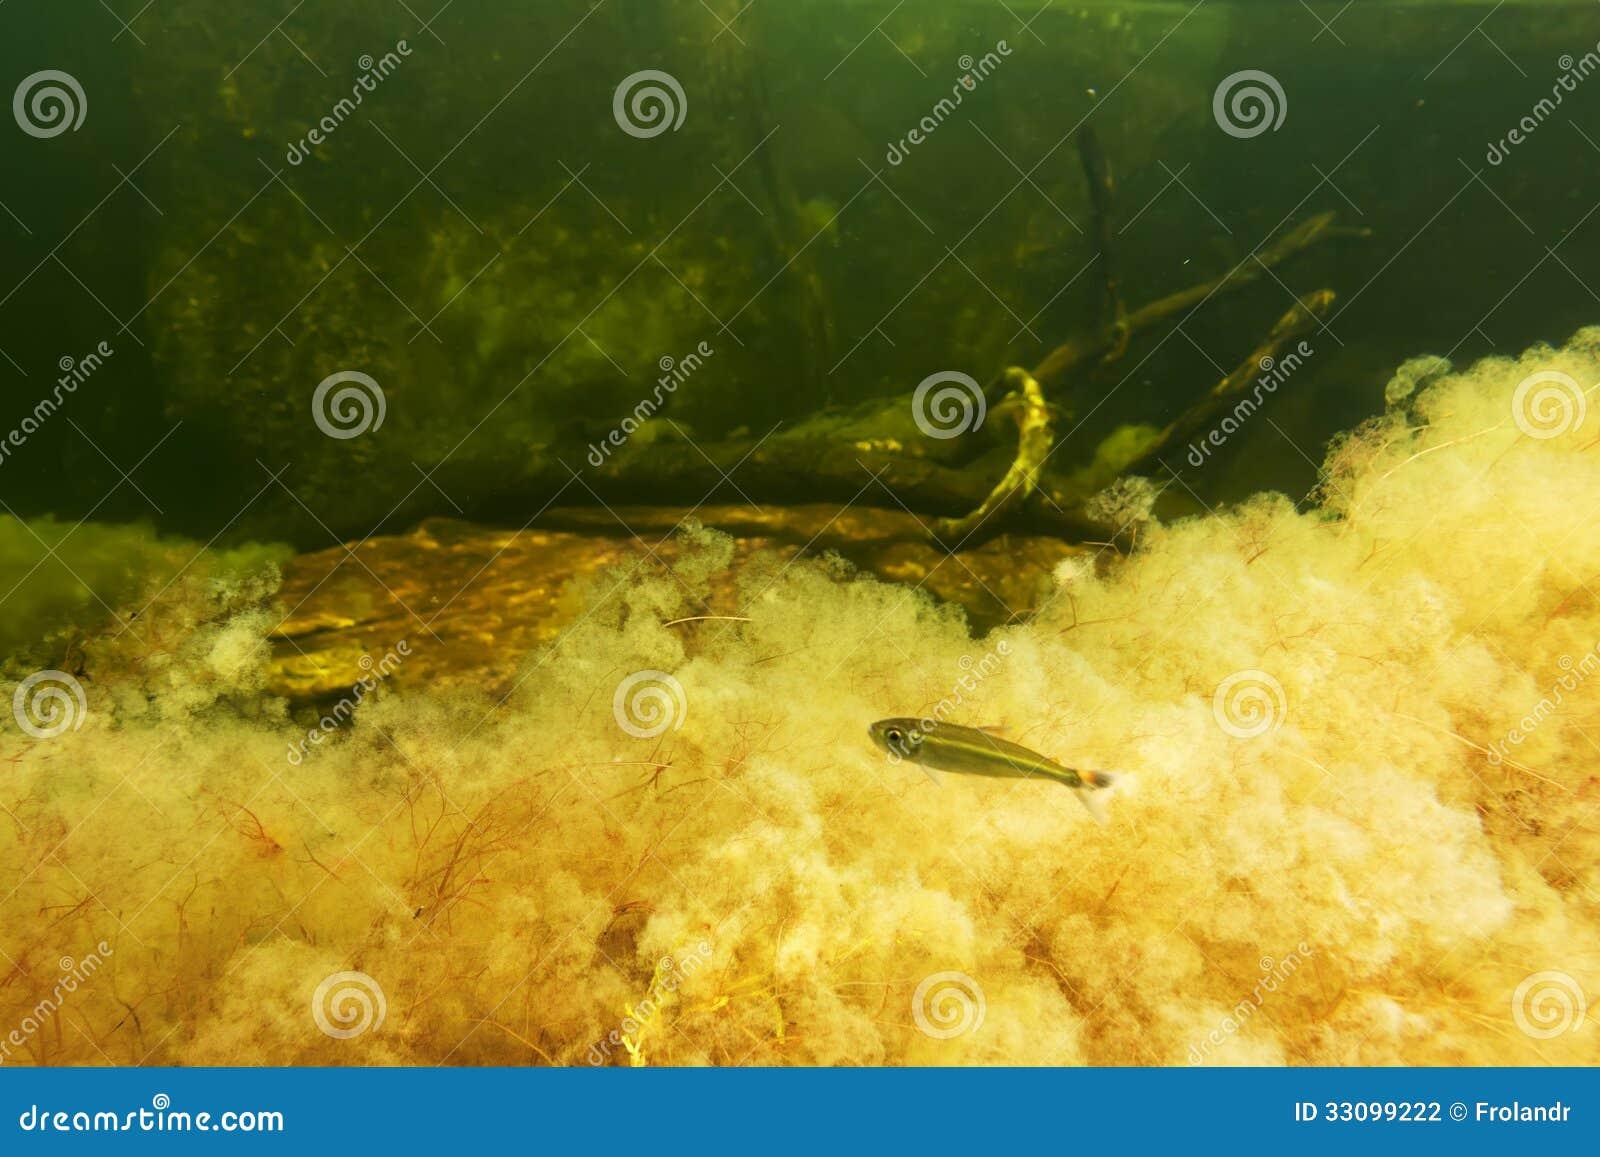 Yellow Macarenia Clavigera With Fish Stock Photography